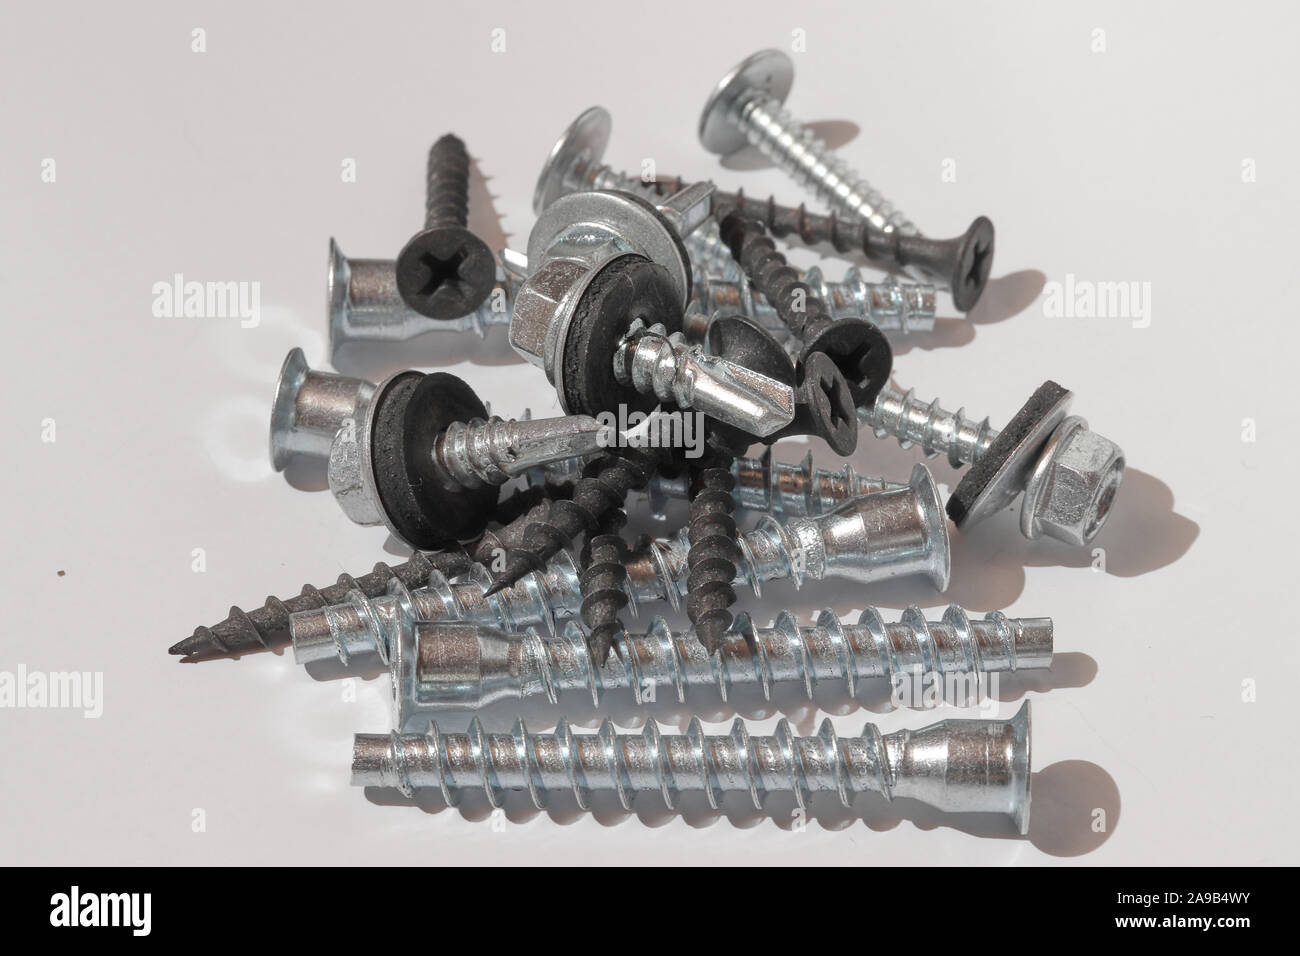 galvanized screws and screws for repair work Stock Photo